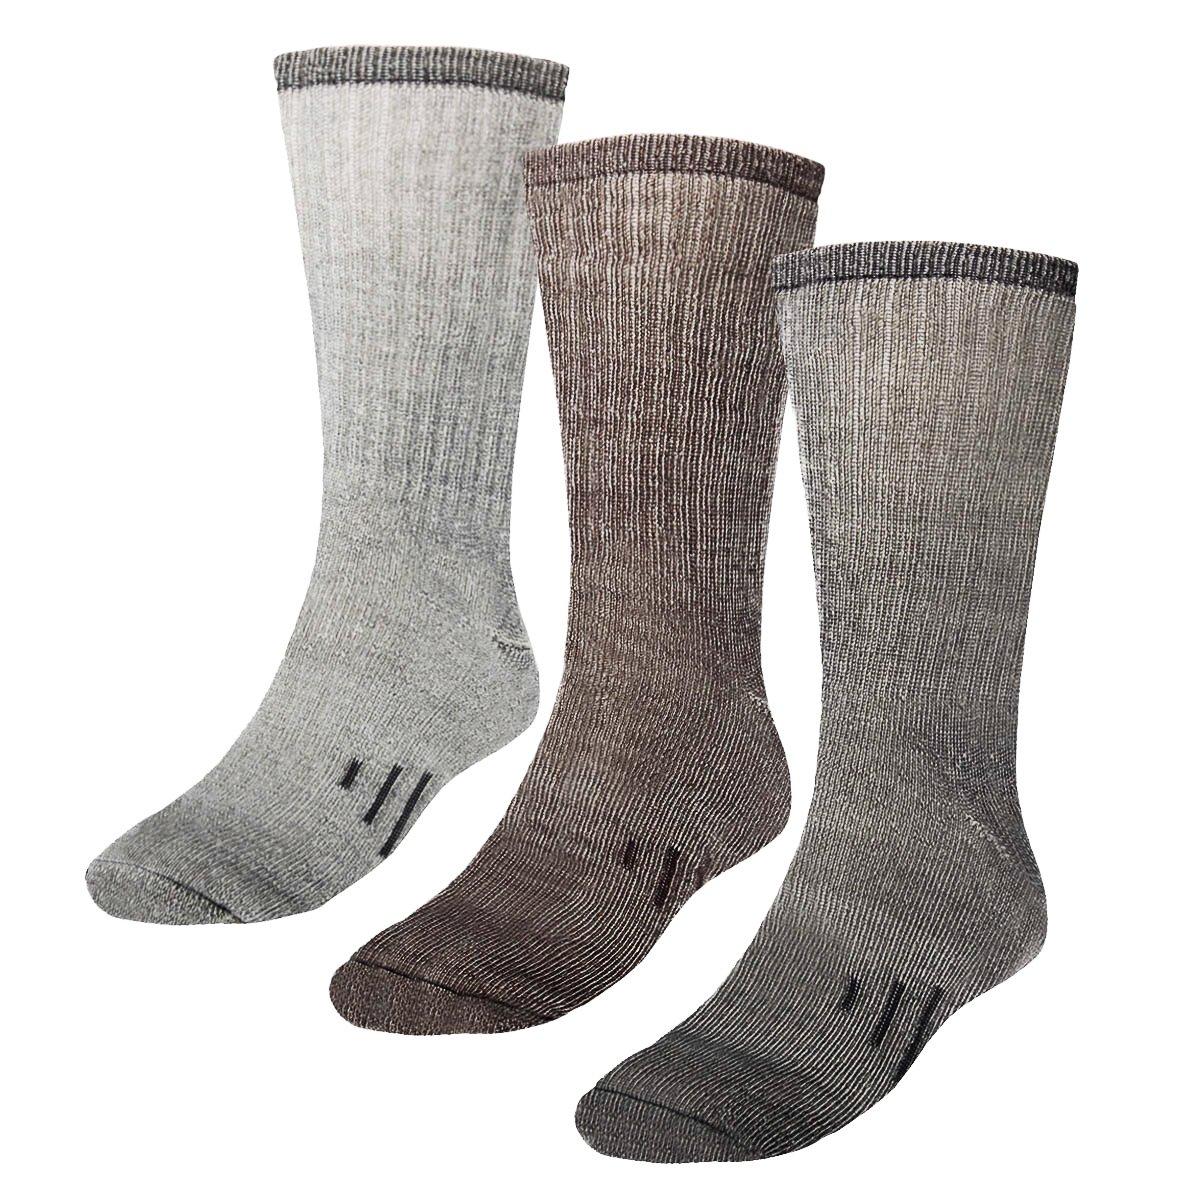 3 Pairs Thermal 80% Merino Wool Socks: Thermal Socks, Crew Socks, Hiking Socks for Winter, Men, Women, Kids DG Hill